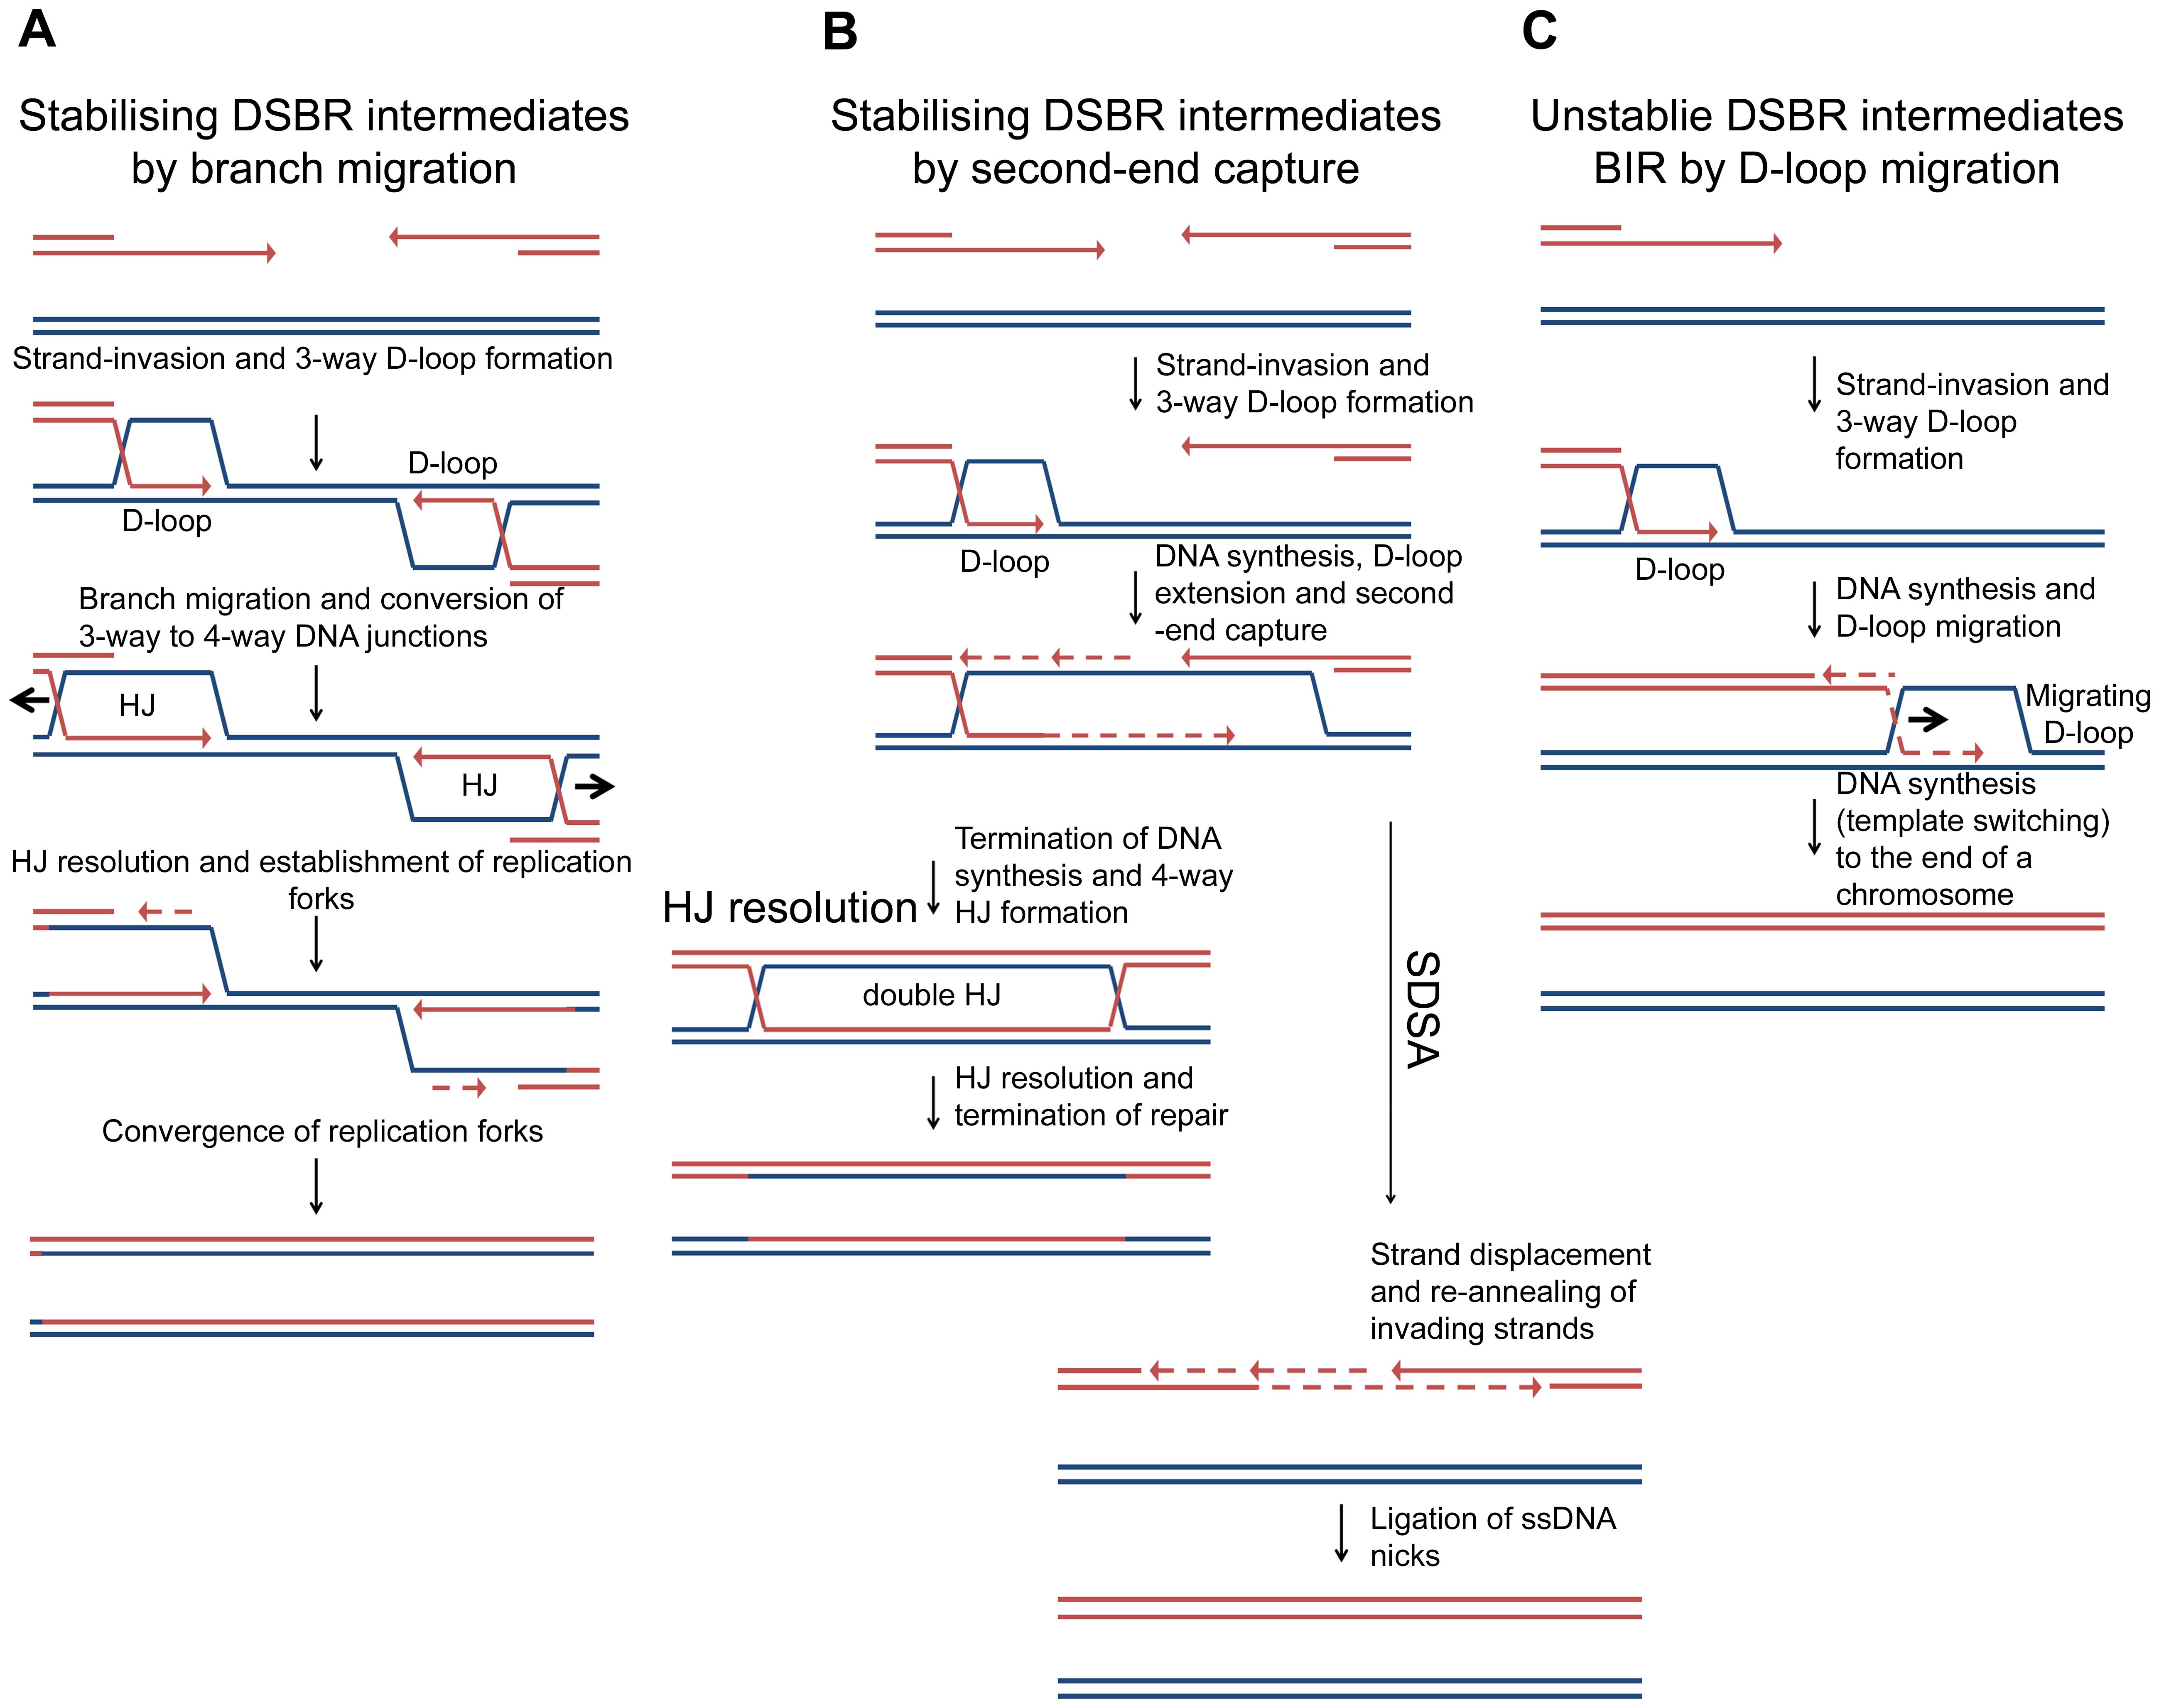 Models of DSBR.